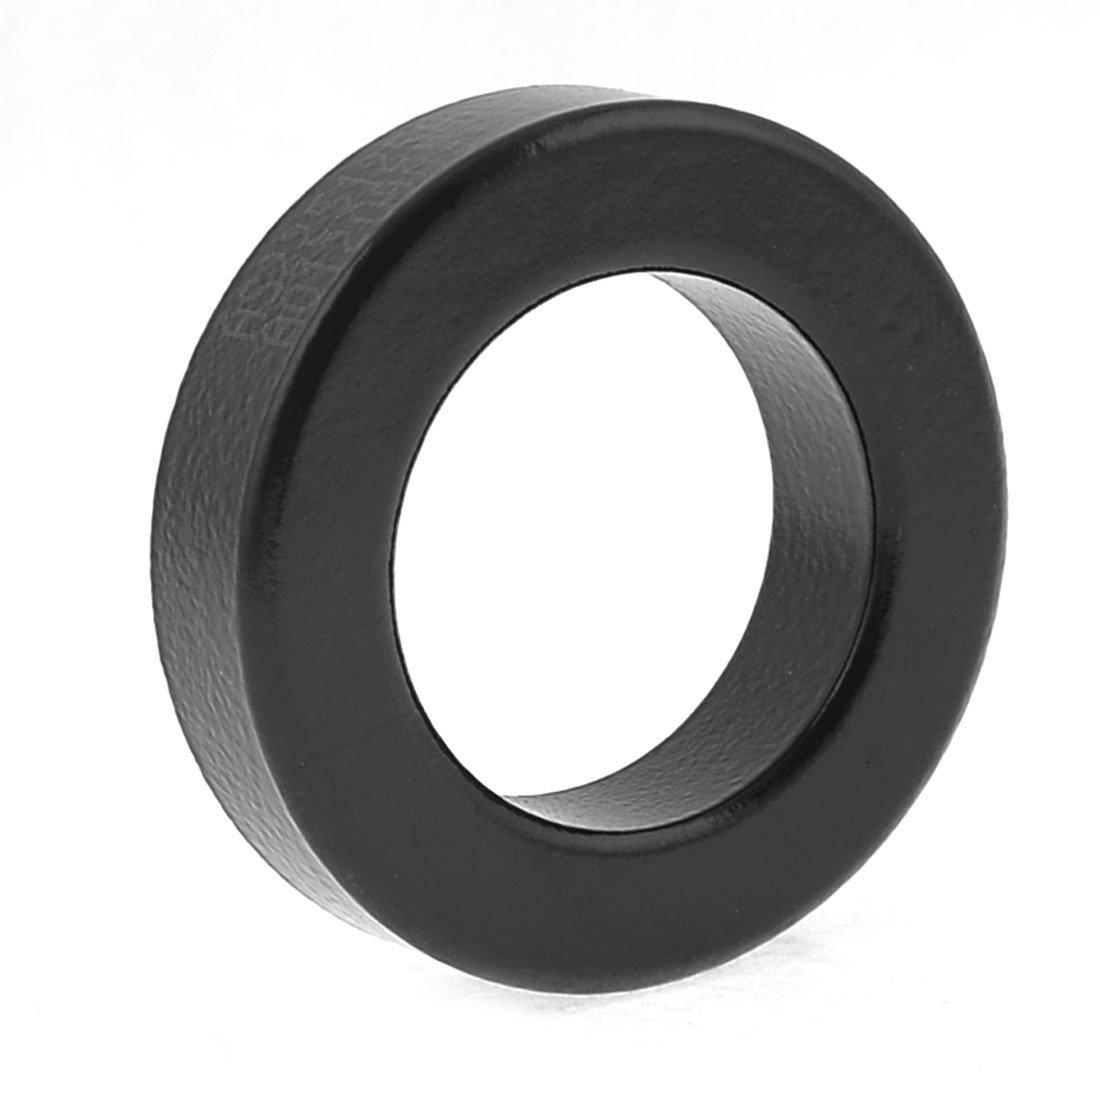 Aexit Transformer Choking Passive Components Coil Parts Toroid Ferrite Core Ferrites AS225-125A Black